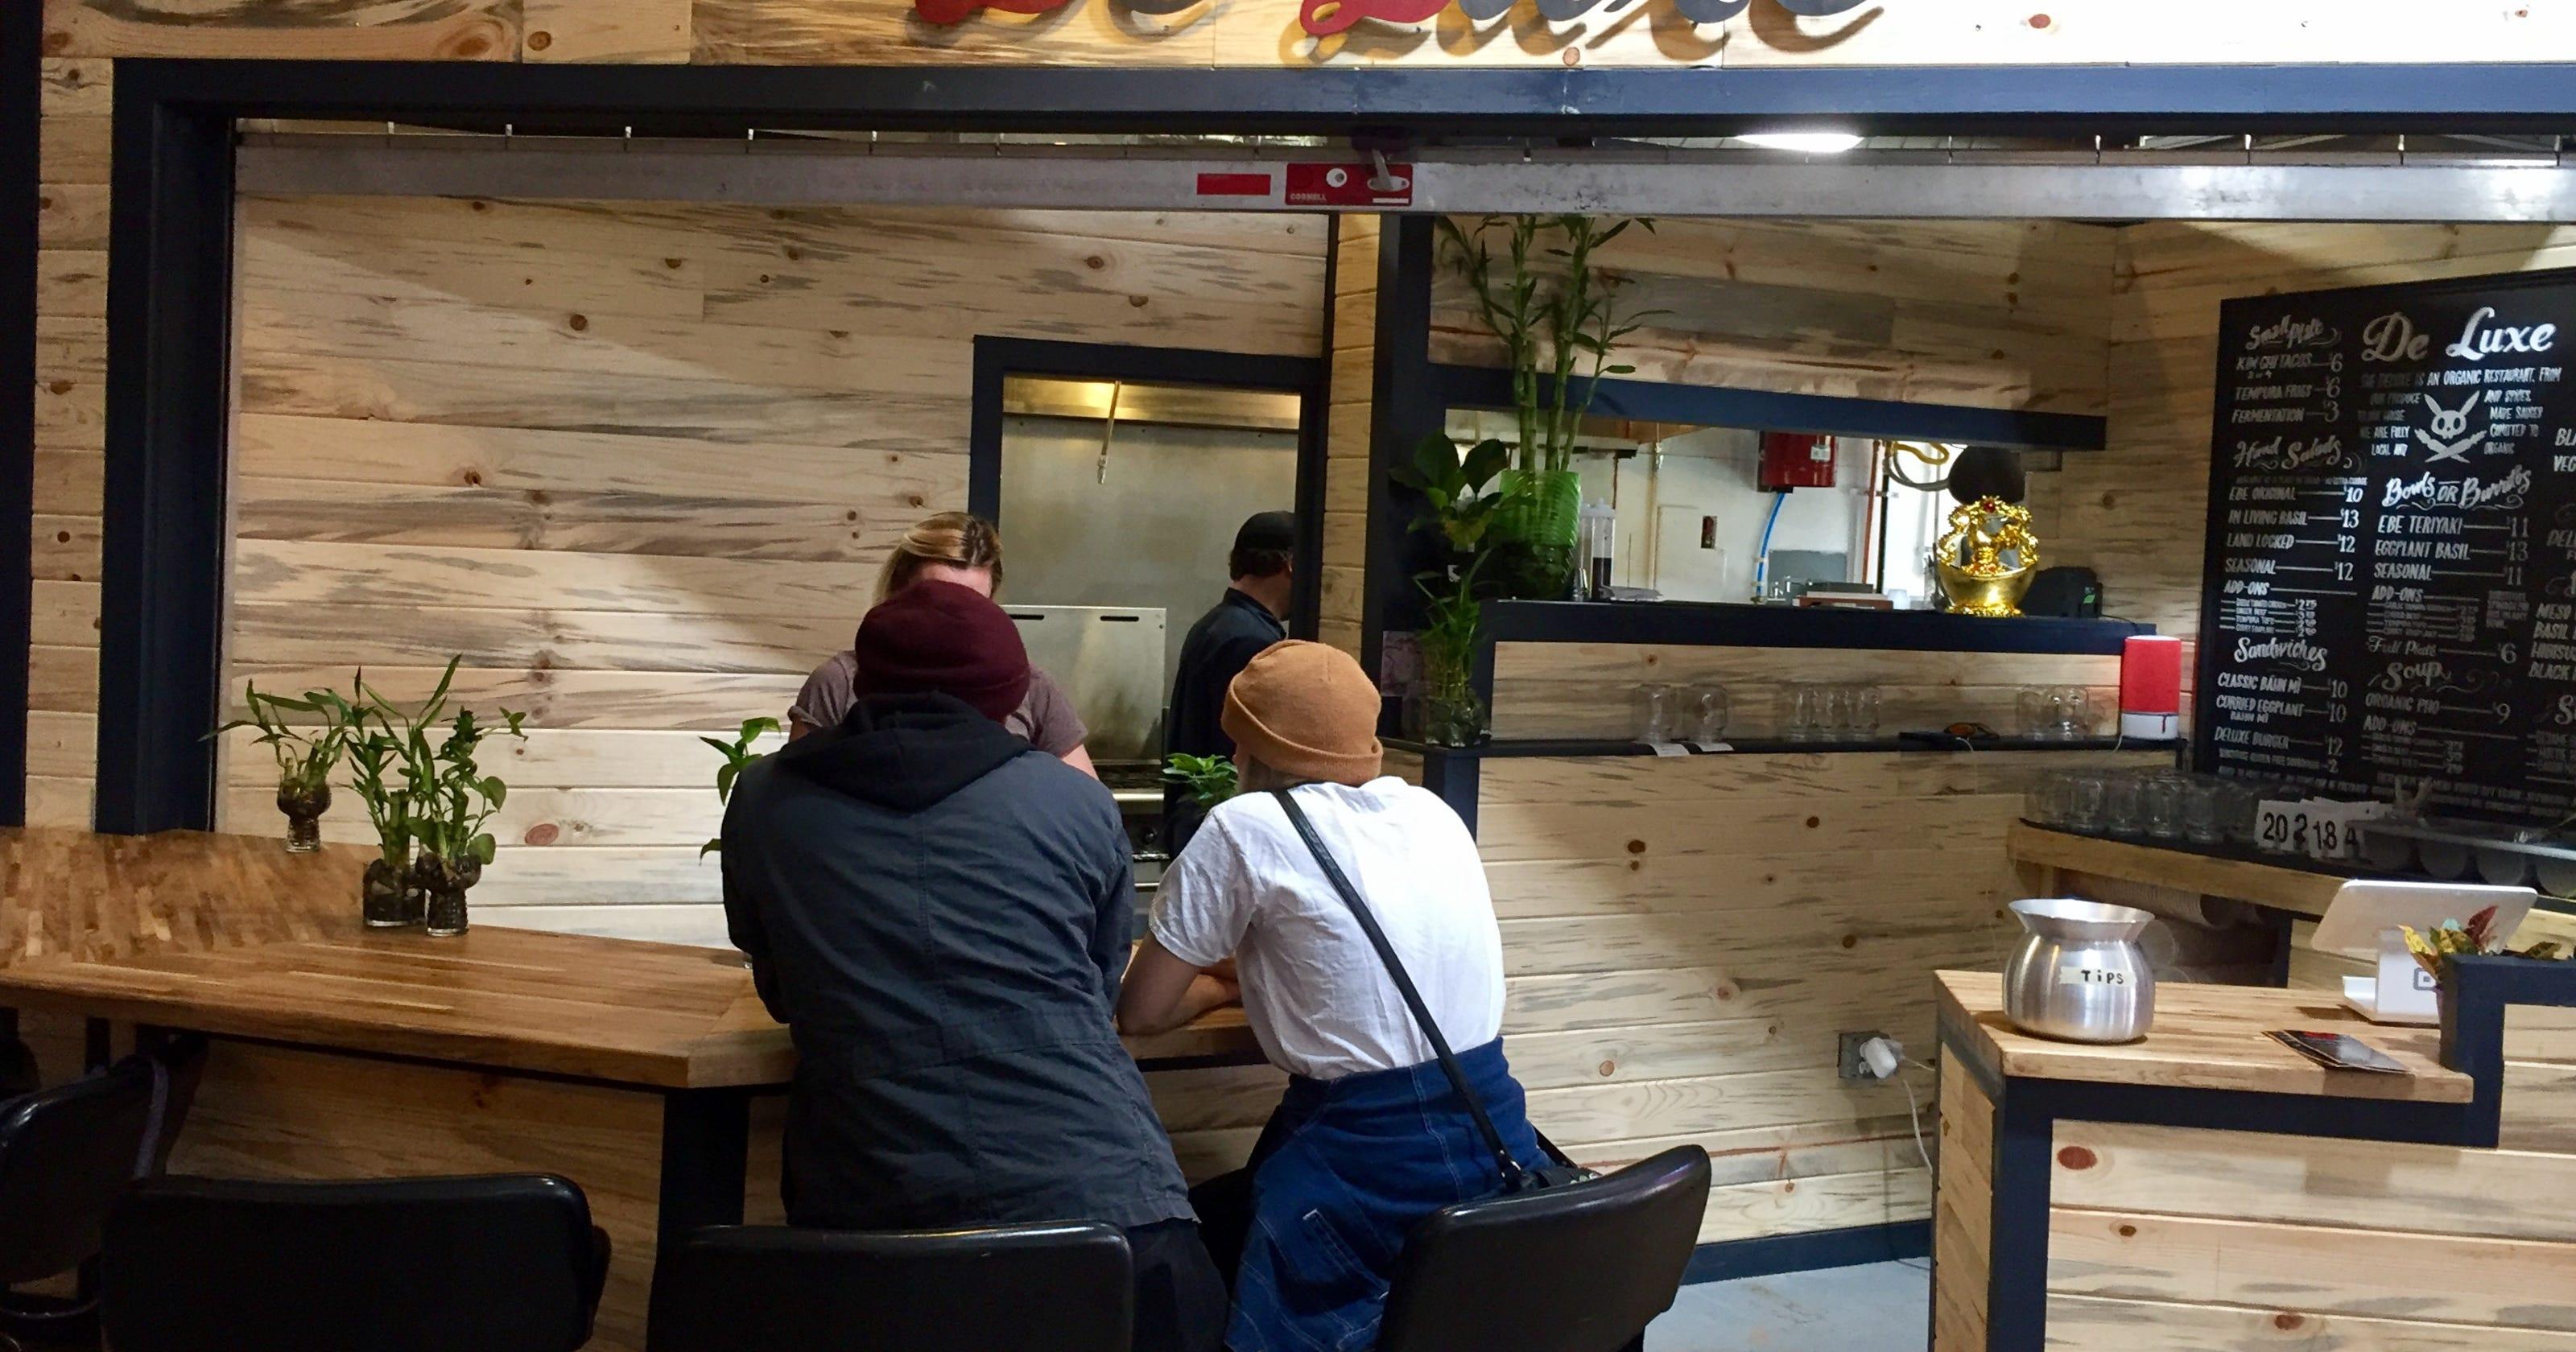 2 restaurants open in West Street Market, another on way